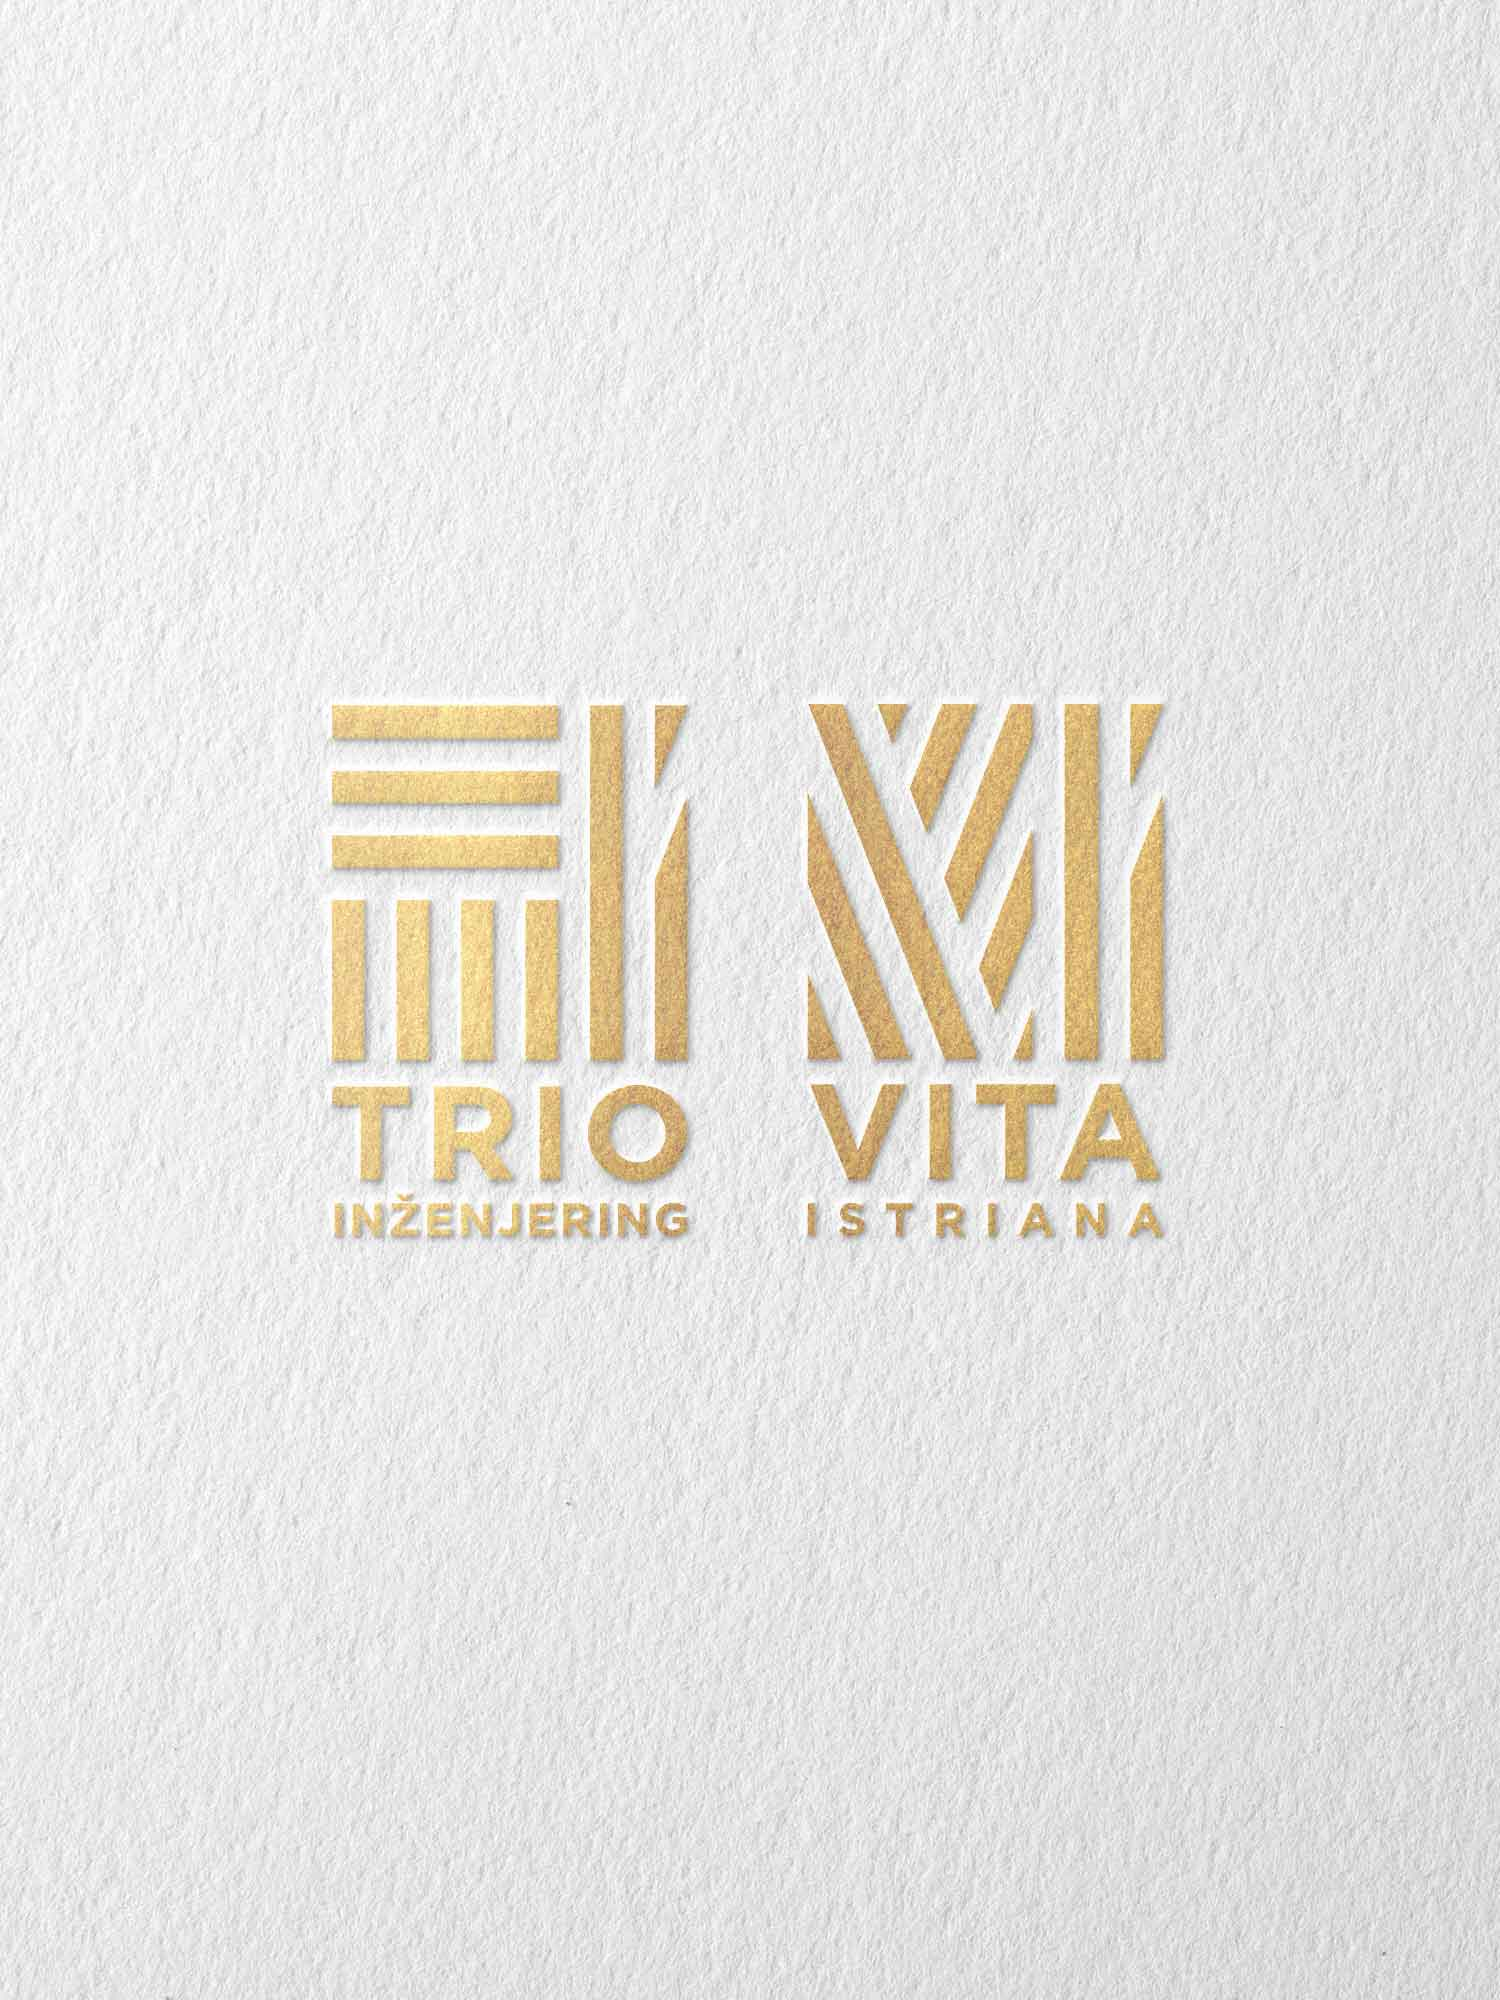 Trio & Vita